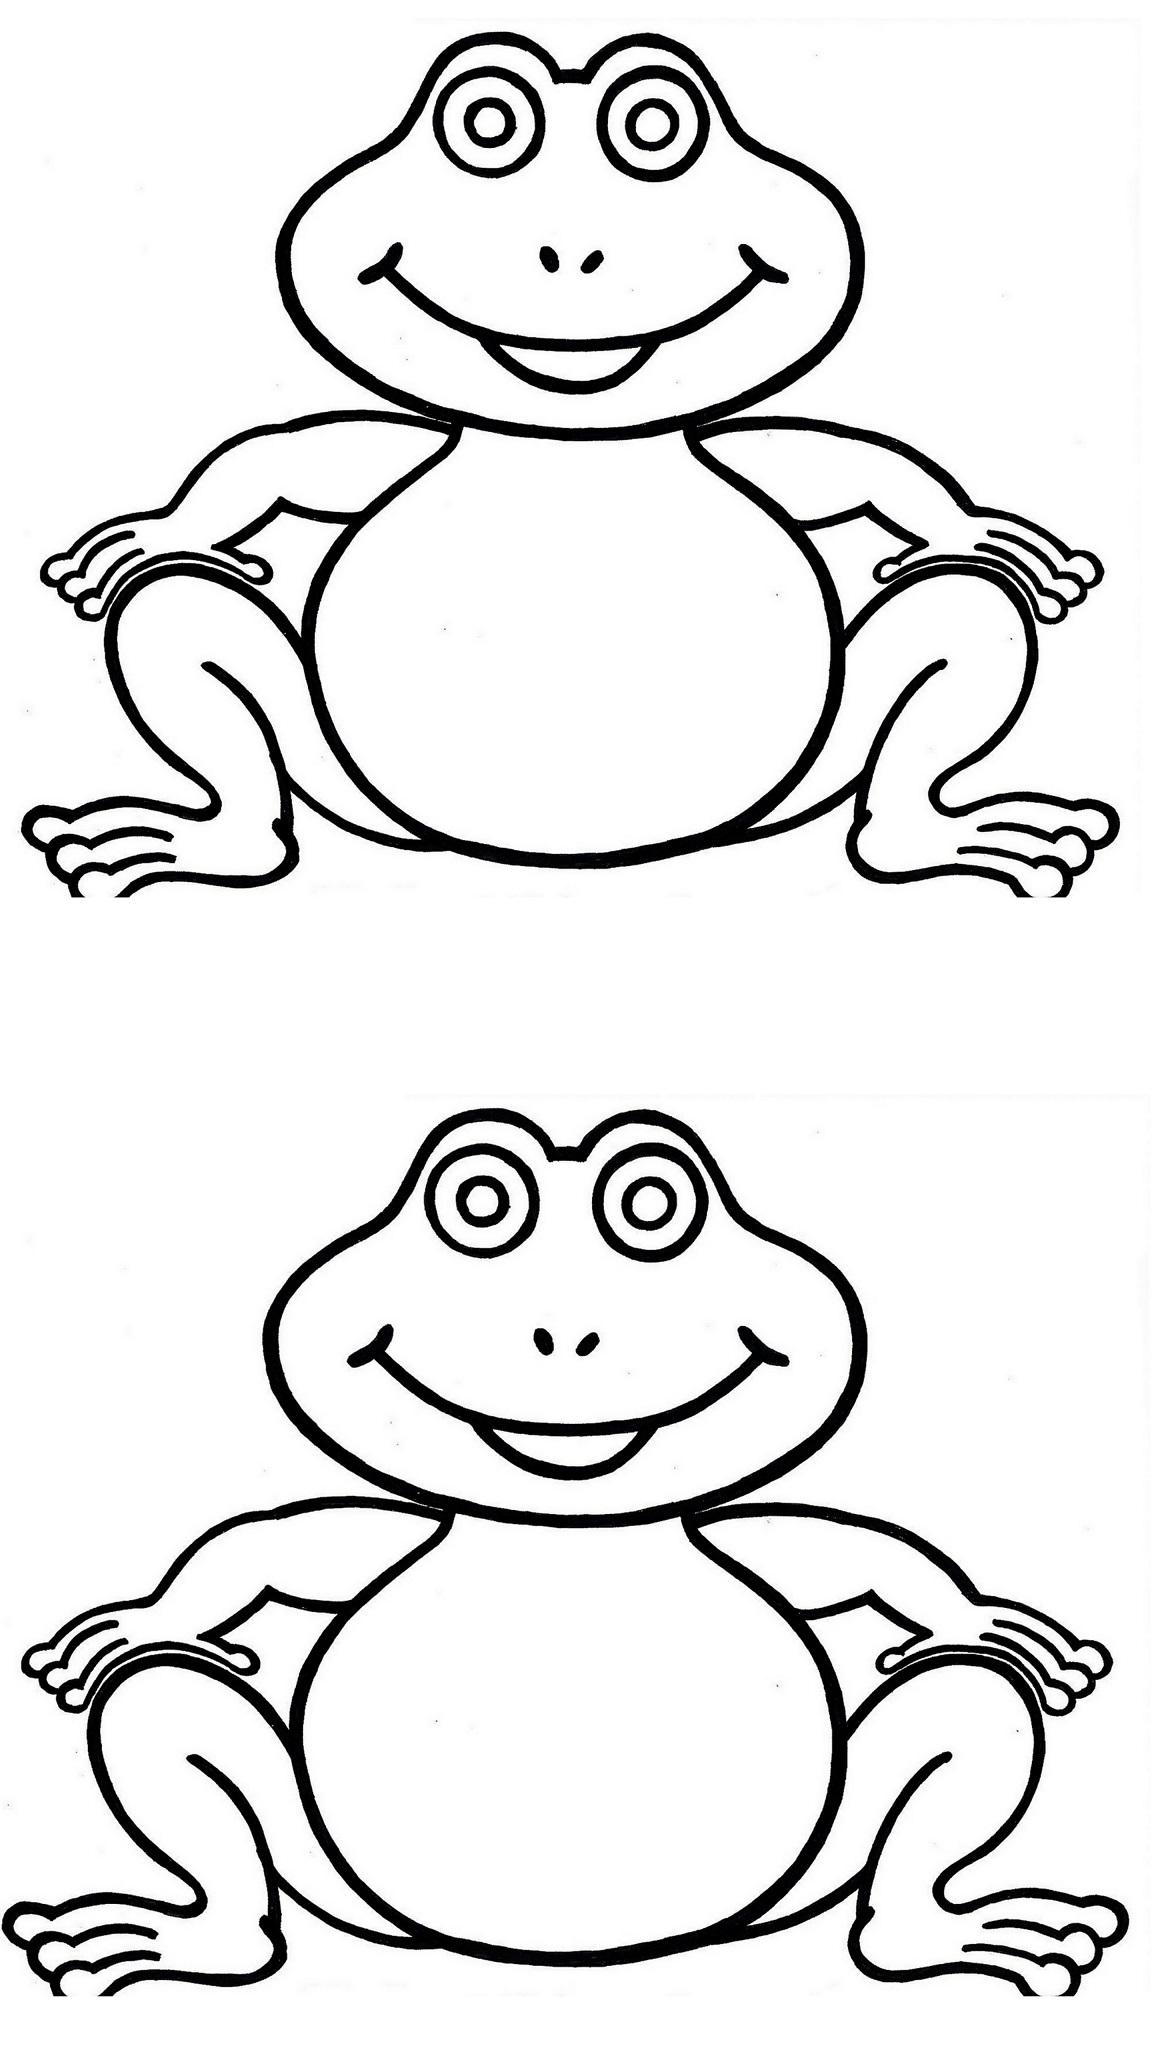 32 dessins de coloriage grenouille  u00e0 imprimer